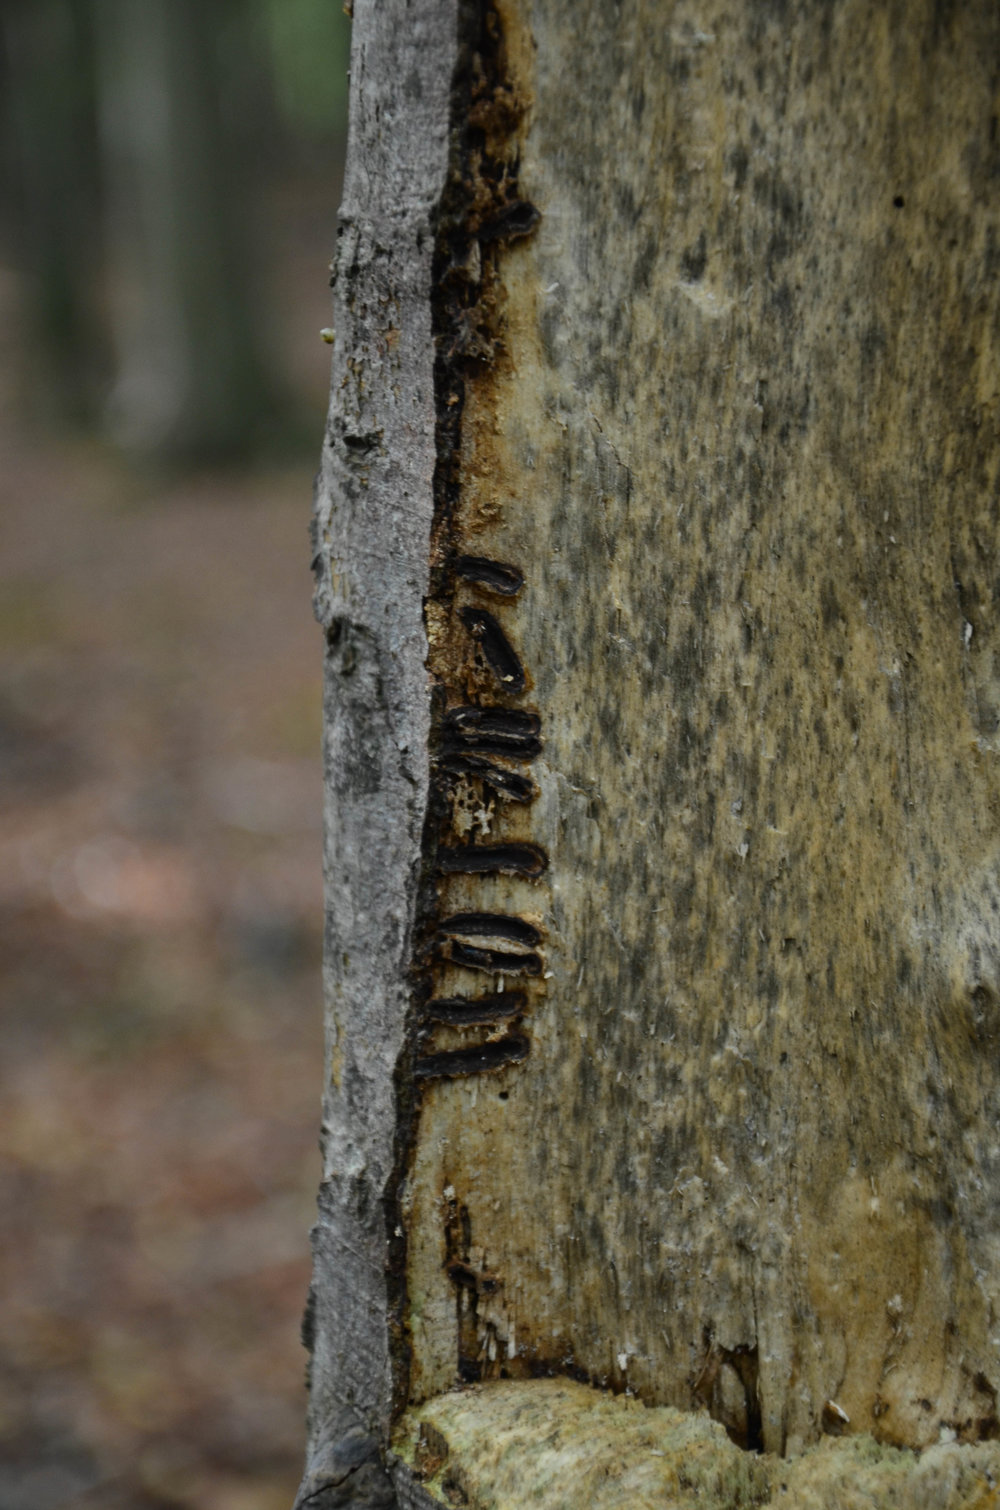 Bergwaldprojekt_Sassnitz_Ruegen_Moor_150dpi_20171014_Credits_CC-BY-SA_Jenni_Ottilie_Keppler-310.jpg